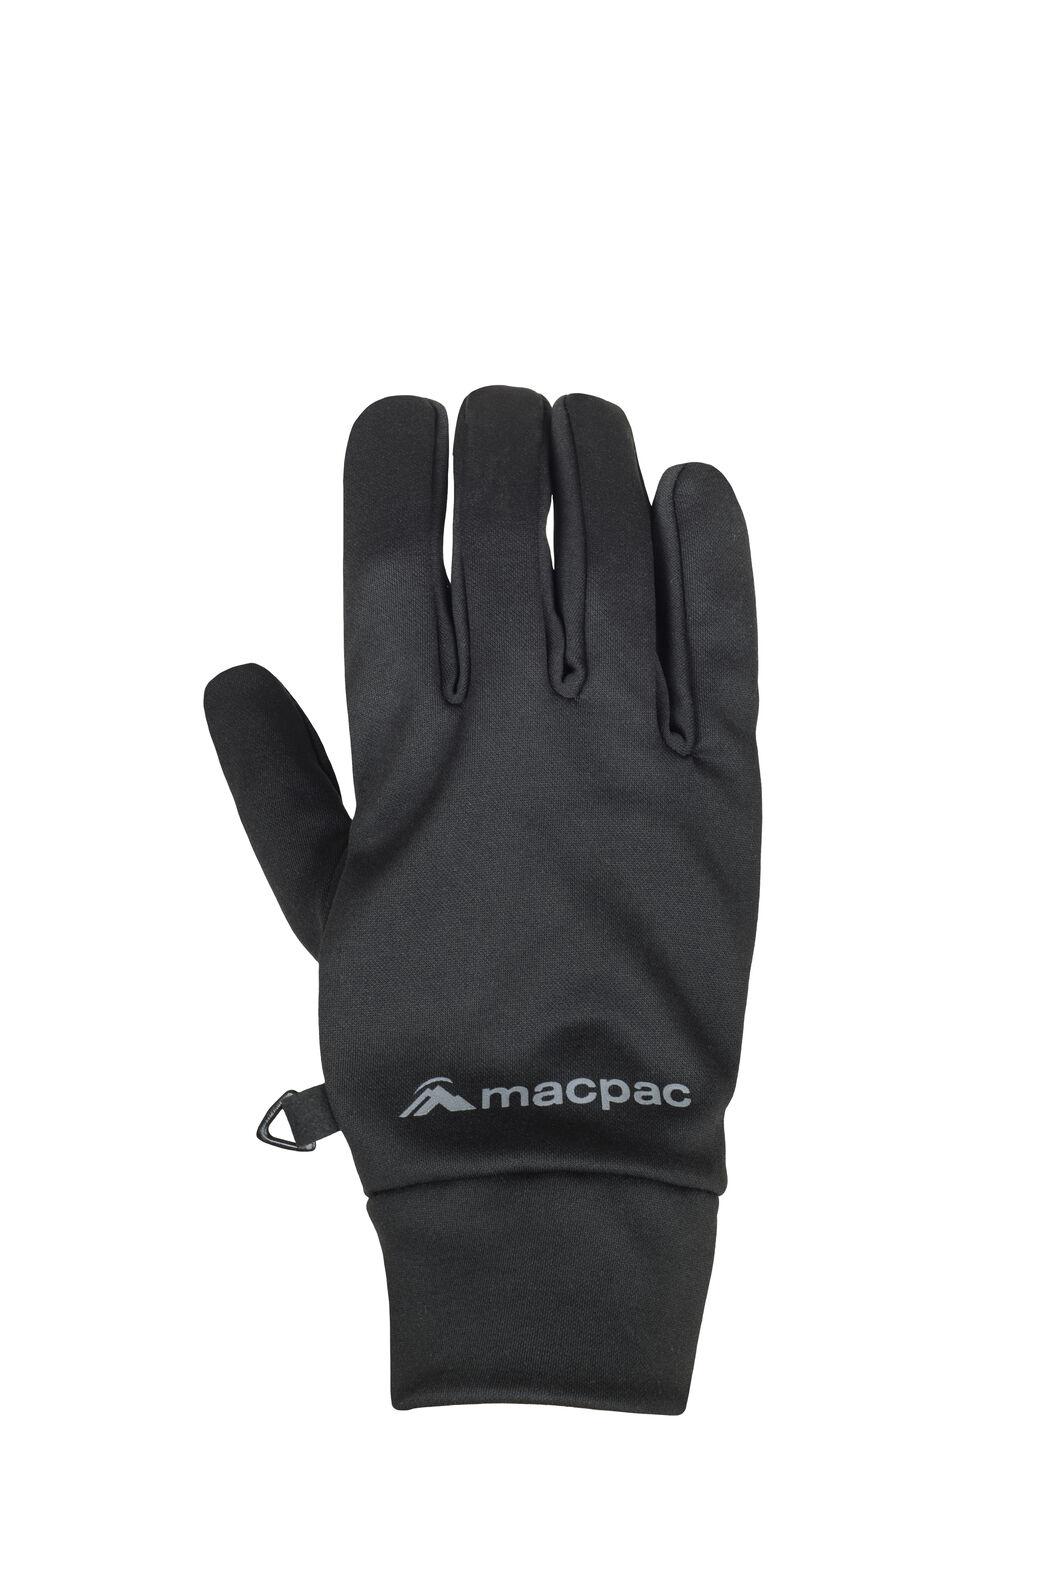 Macpac Stretch Gloves, Black, hi-res